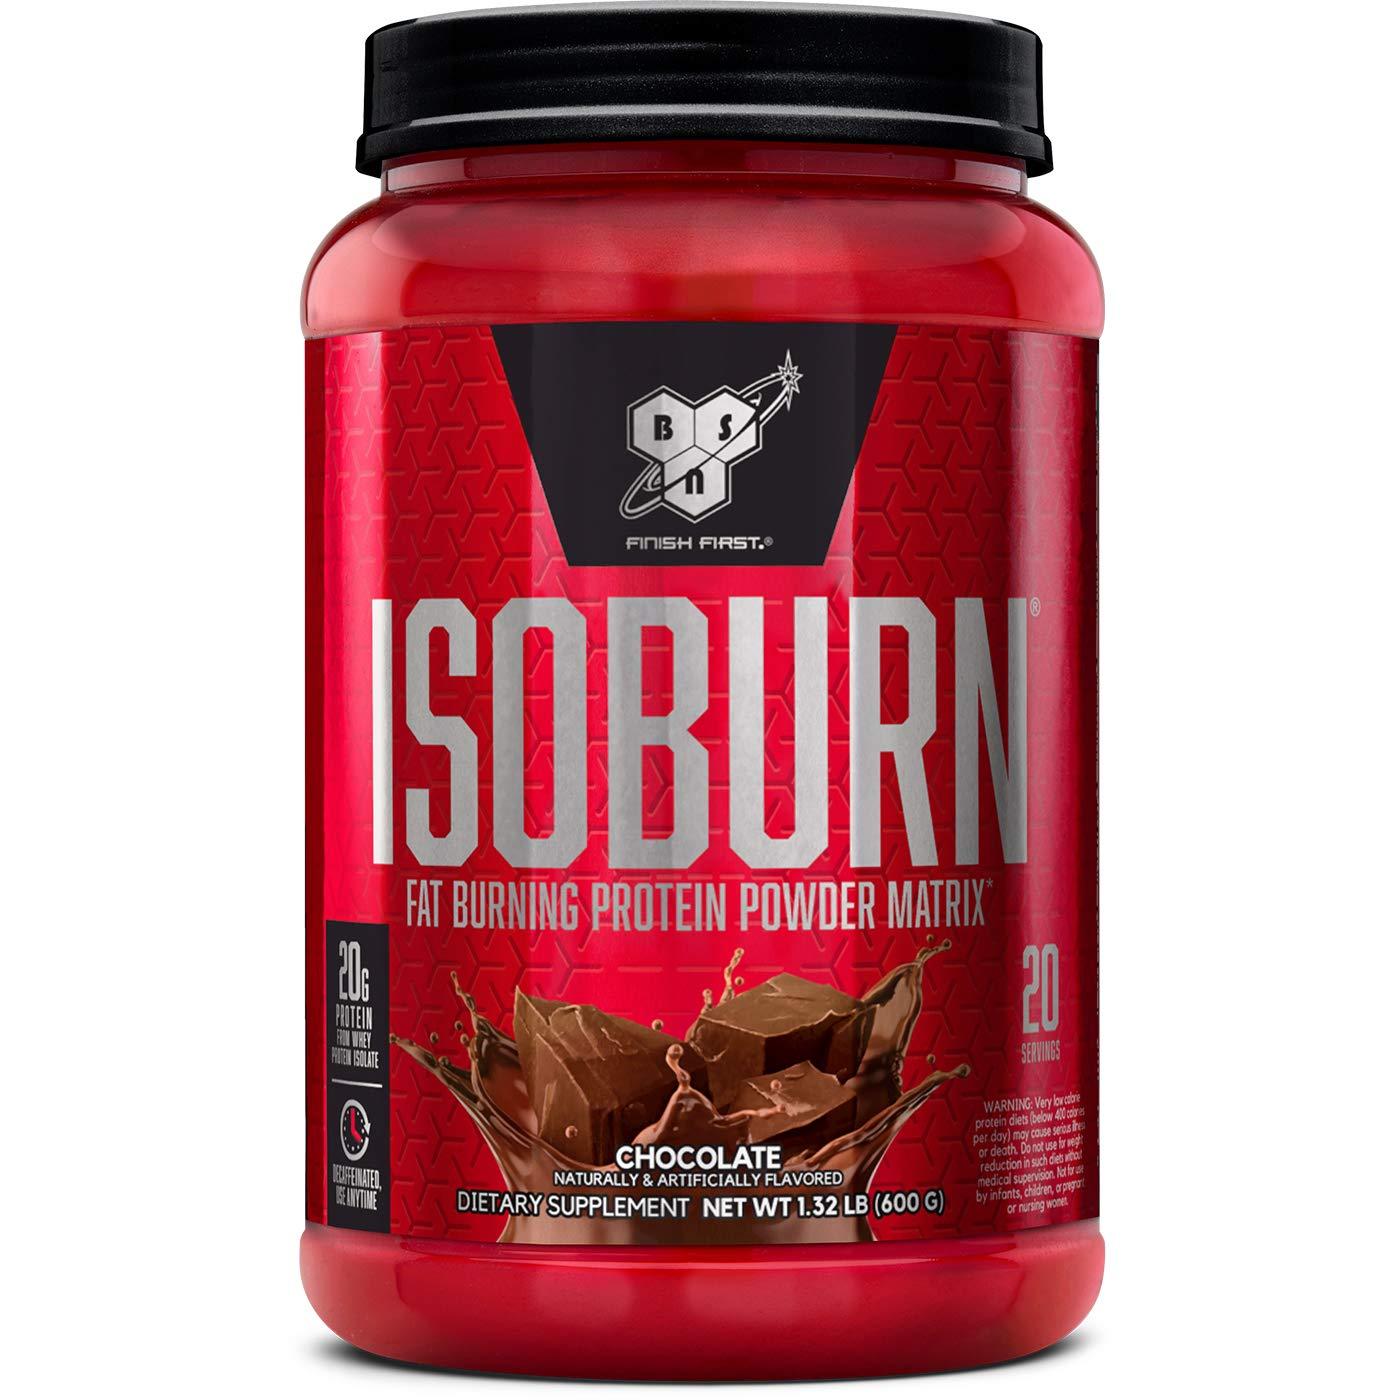 BSN ISOBURN Protein Powder L carnitine